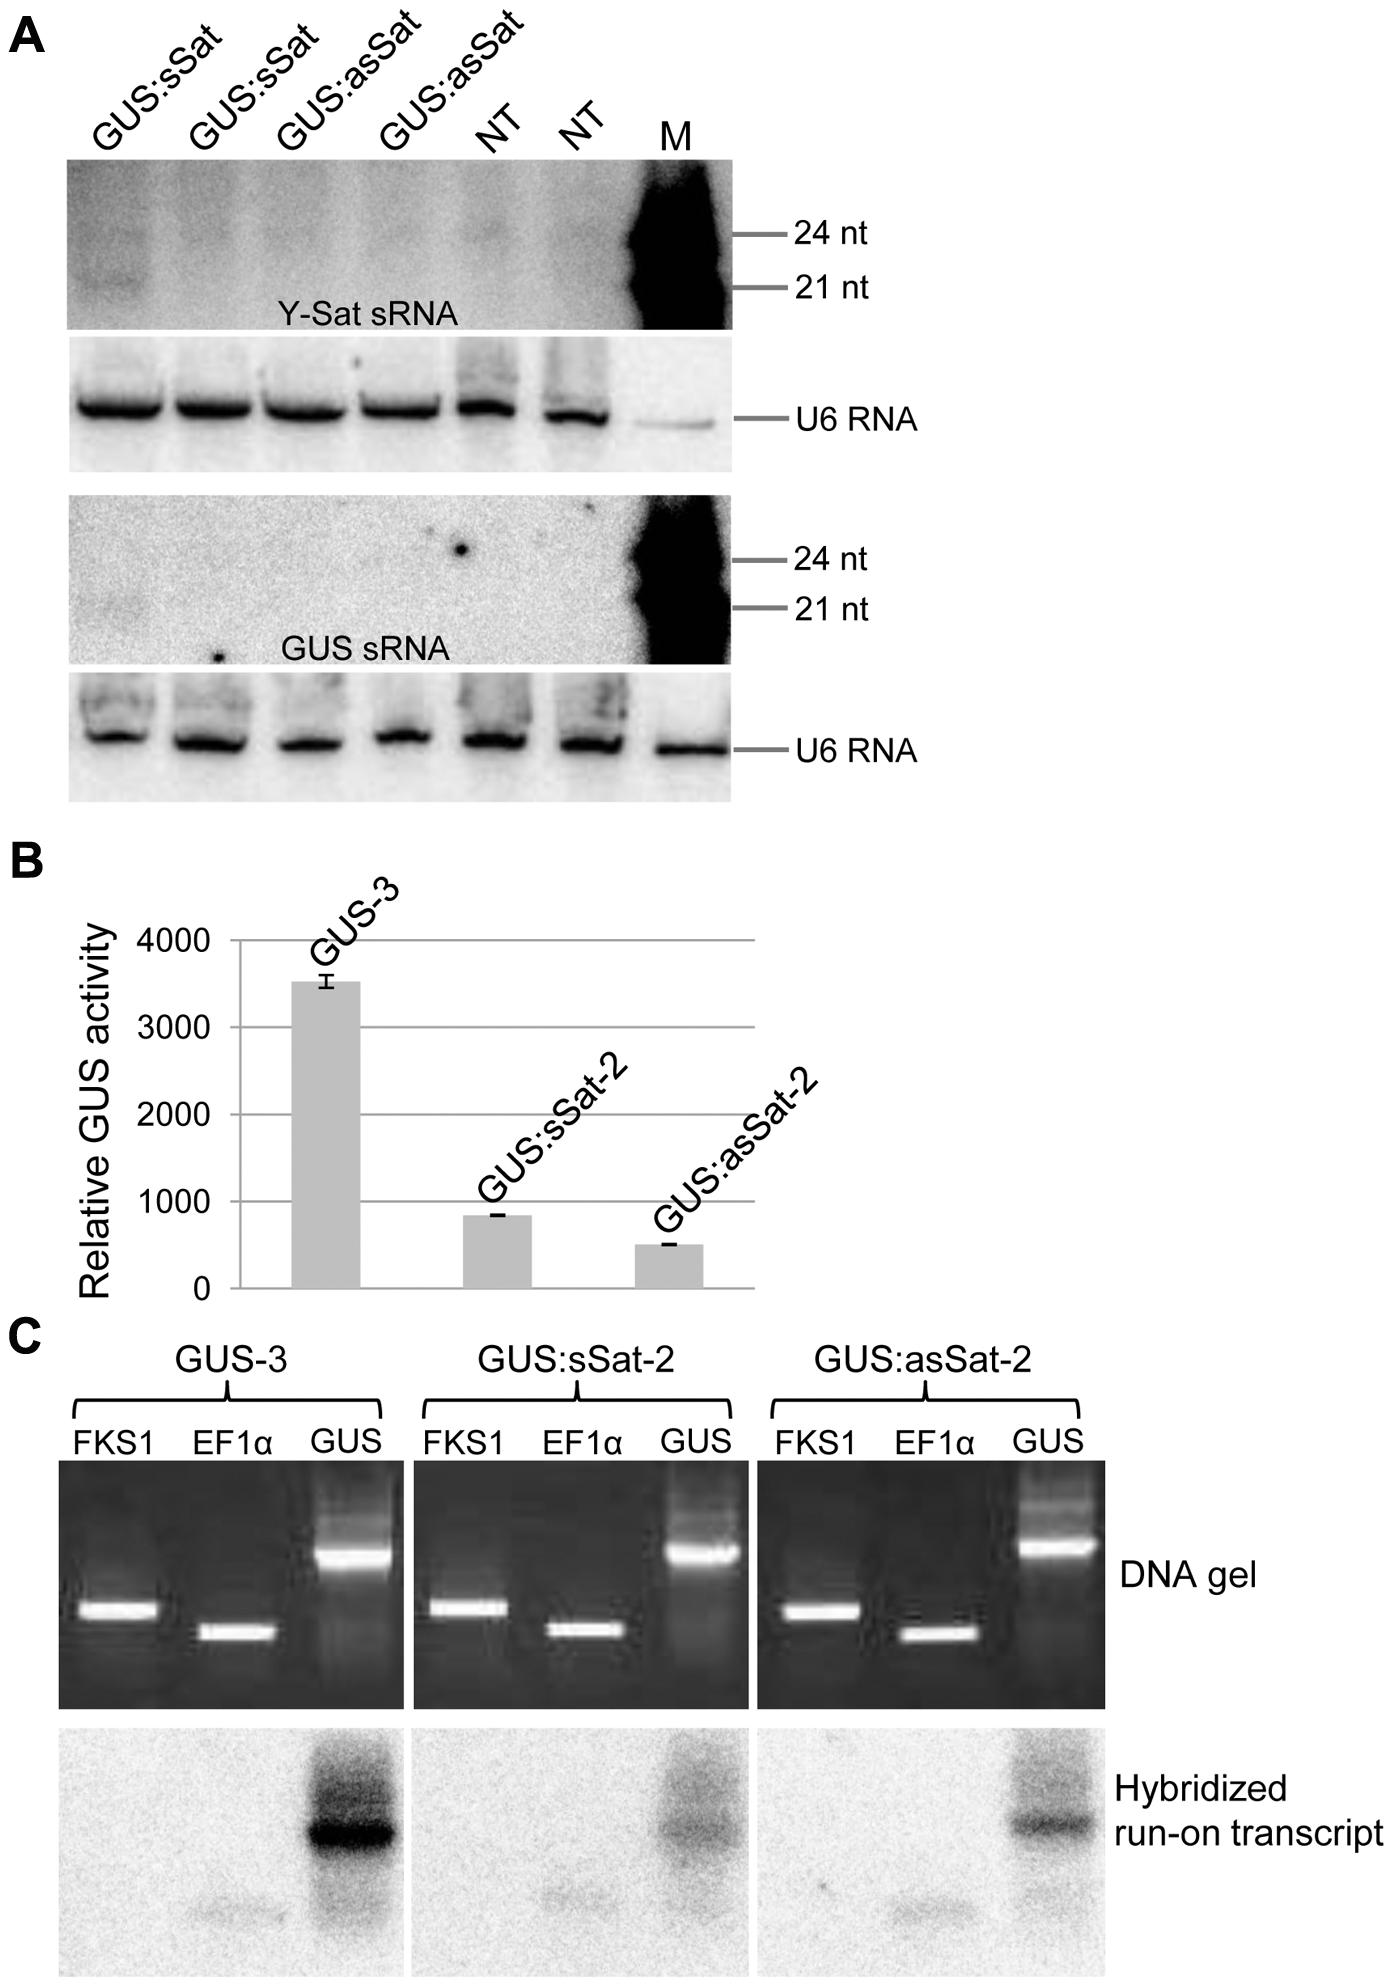 The 35S-GUS:Sat transgene is transcriptionally repressed.